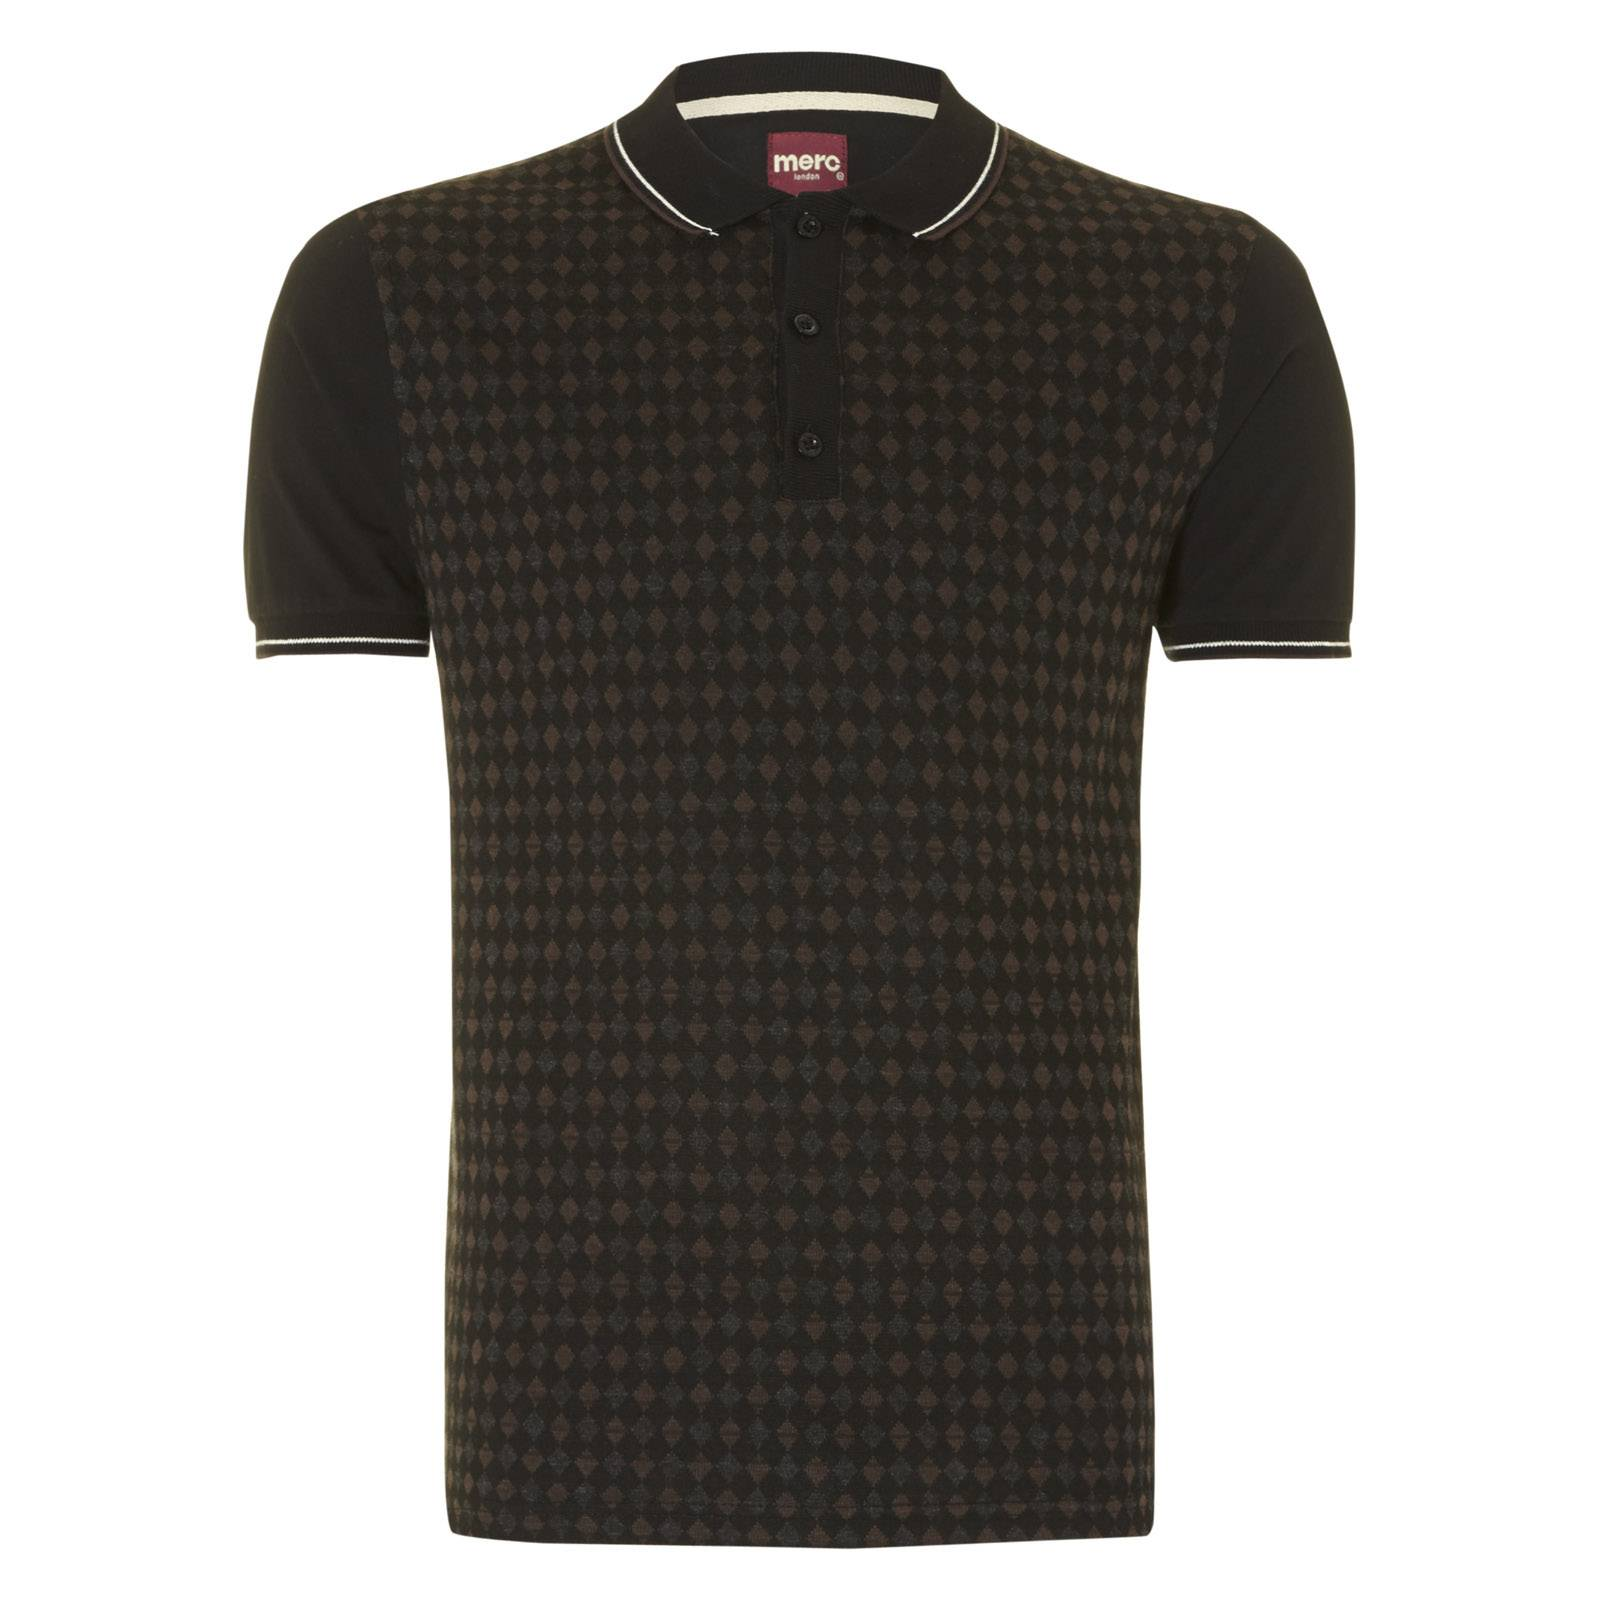 Рубашка Поло WareПоло<br><br><br>Артикул: 1914205<br>Материал: Передняя сторона - 60% полиэстер, 35% вискоза, 5% эластан; Задняя сторона - 100% хлопок<br>Цвет: темно-коричневый<br>Пол: Мужской